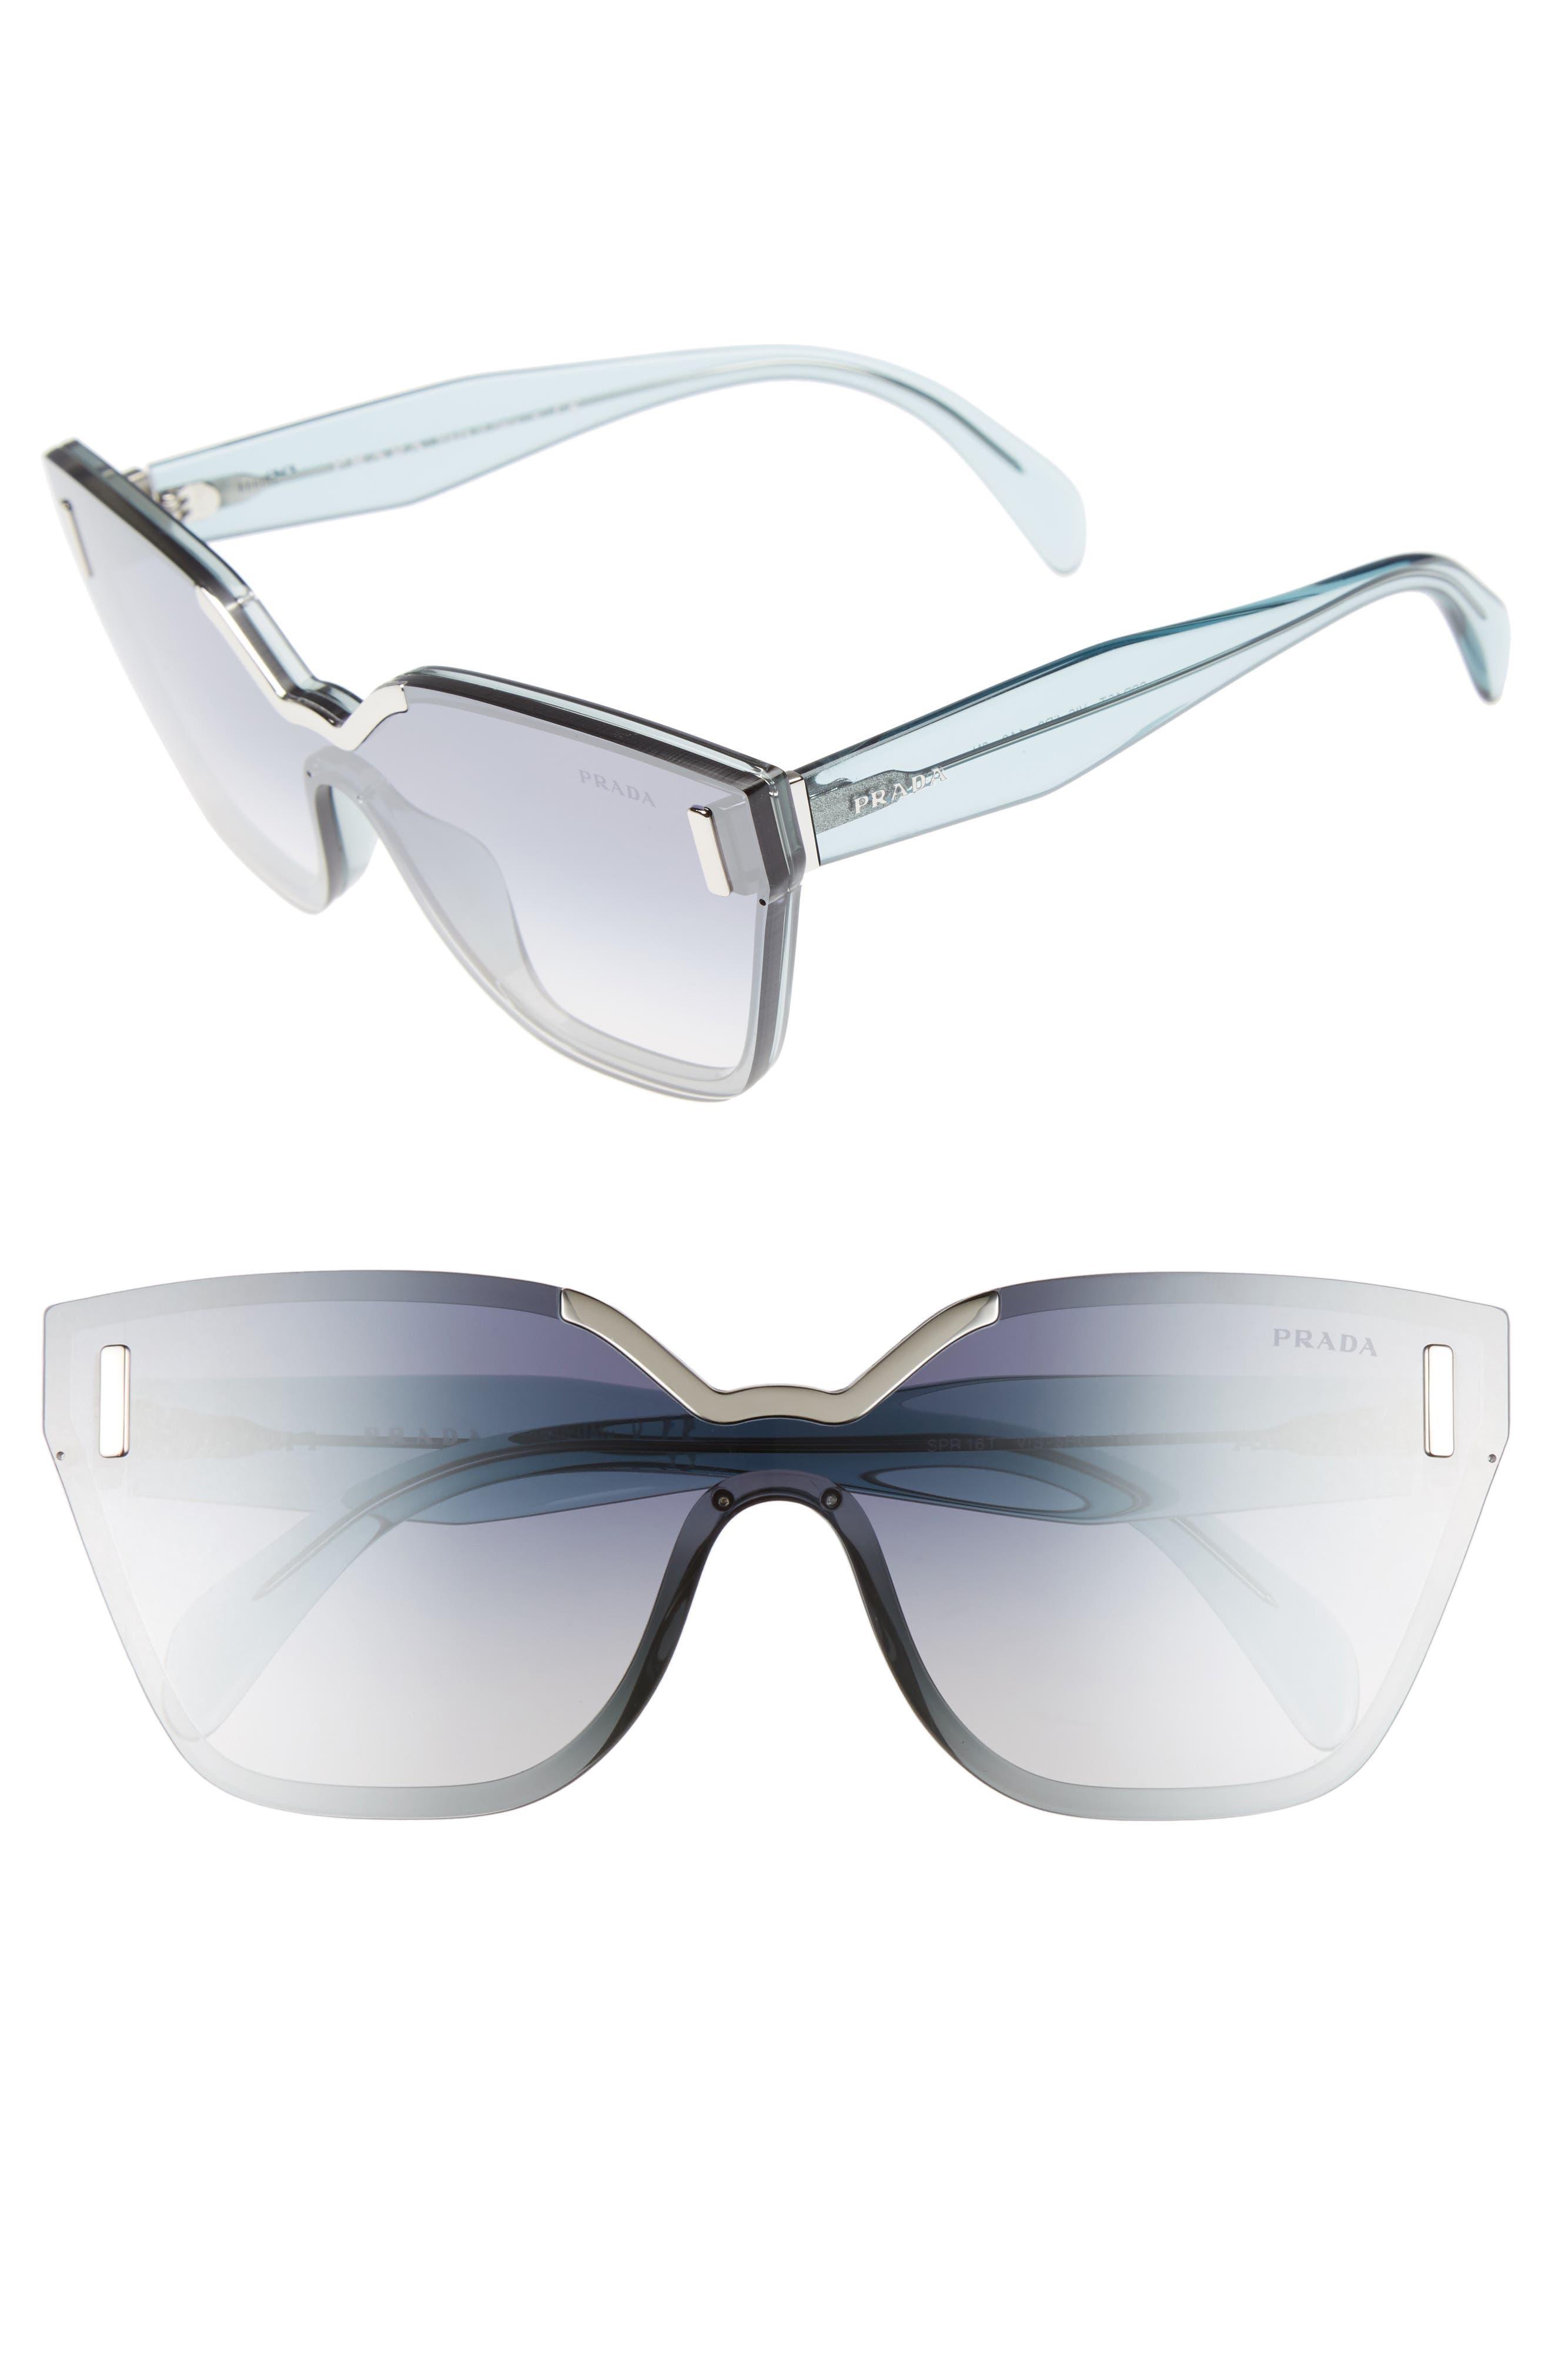 Alternate Image 1 Selected - Prada 61mm Mirrored Shield Sunglasses